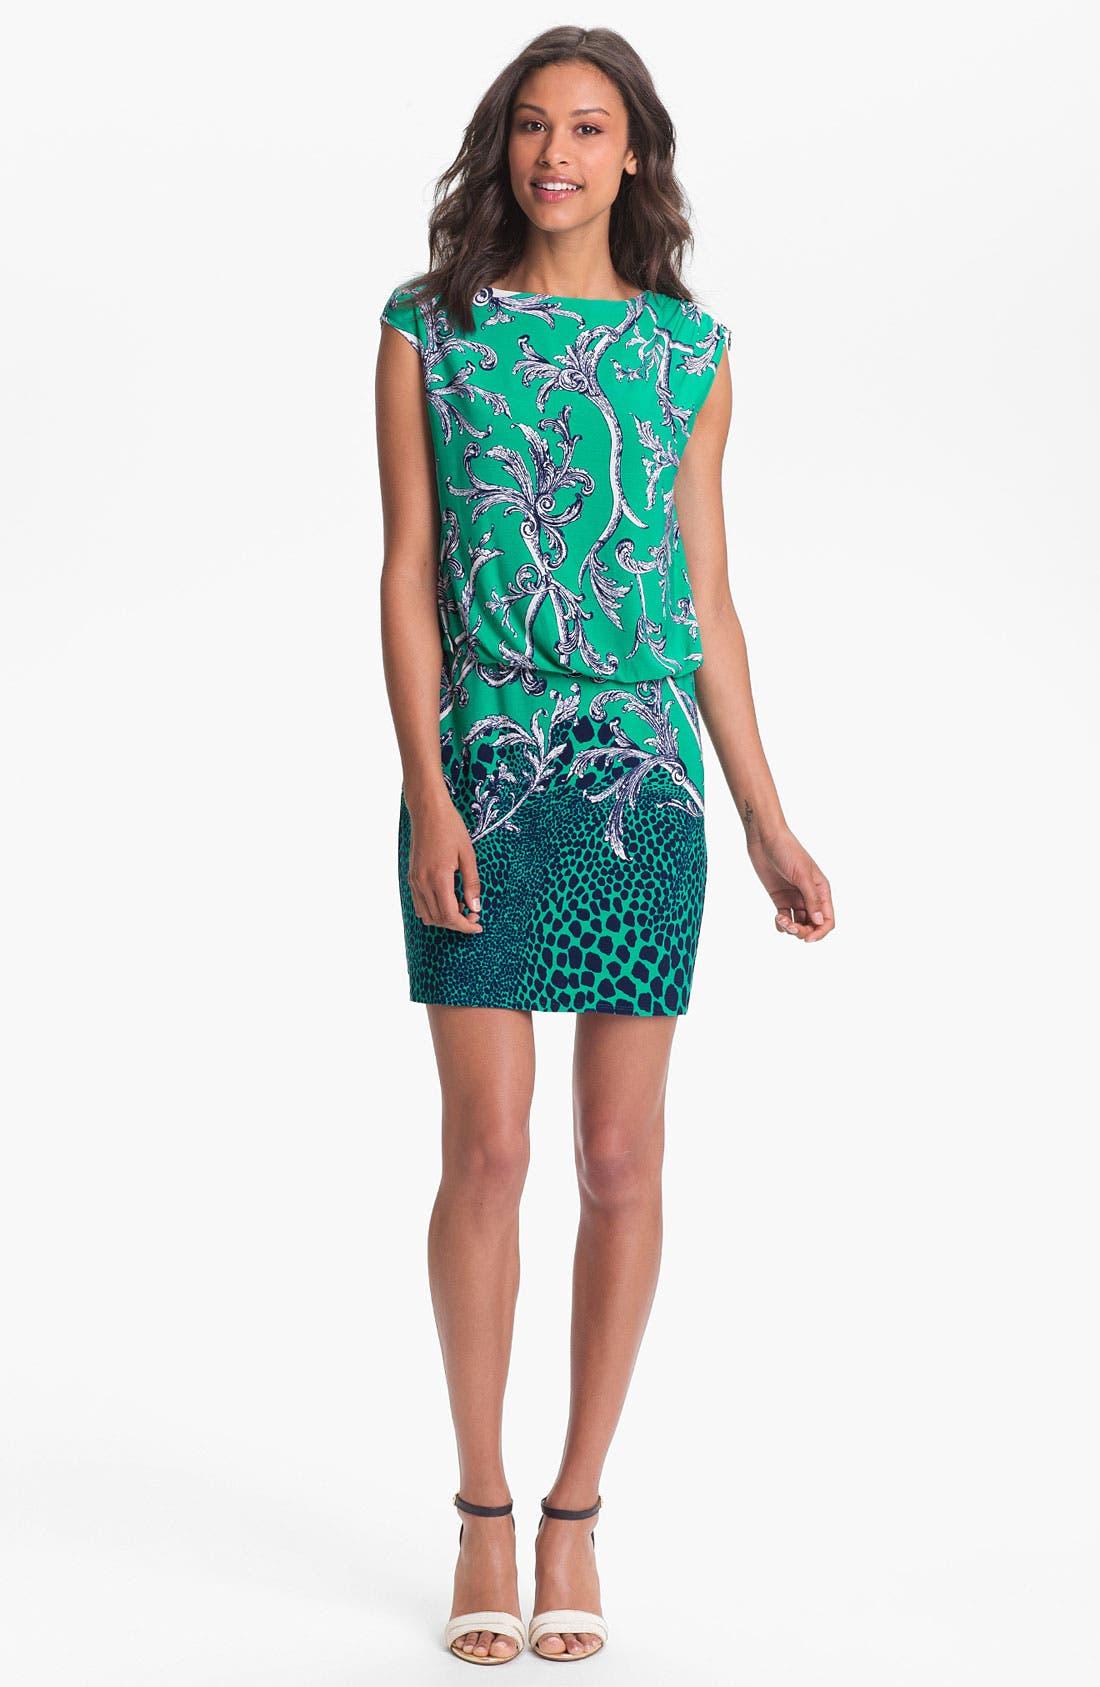 Alternate Image 1 Selected - Laundry by Shelli Segal Mix Print Jersey Blouson Dress